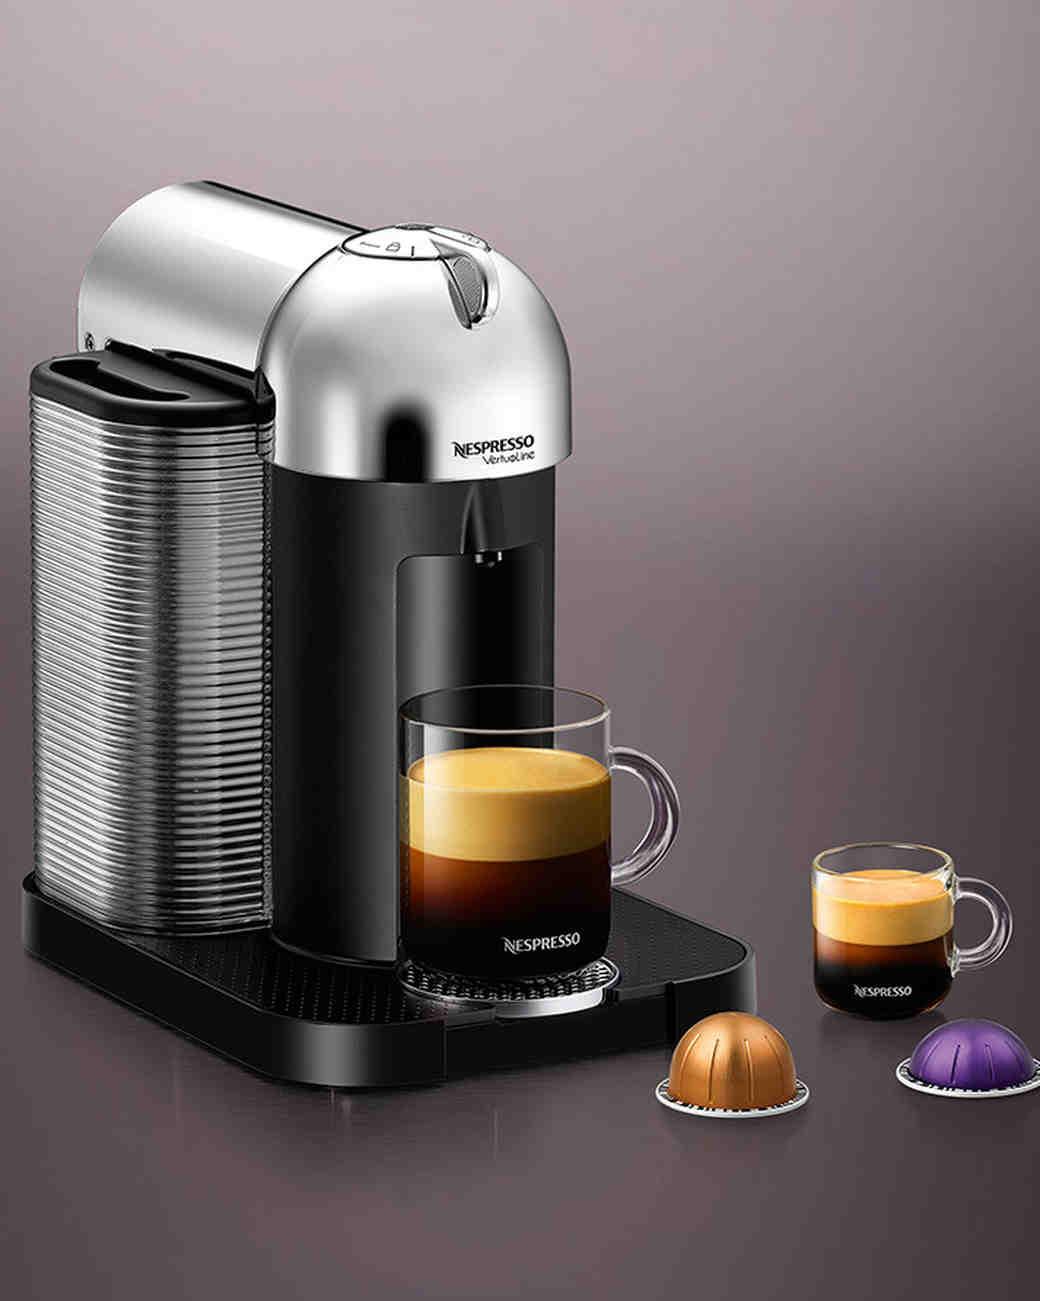 grooms-gift-nespresso-machine-0616.jpg